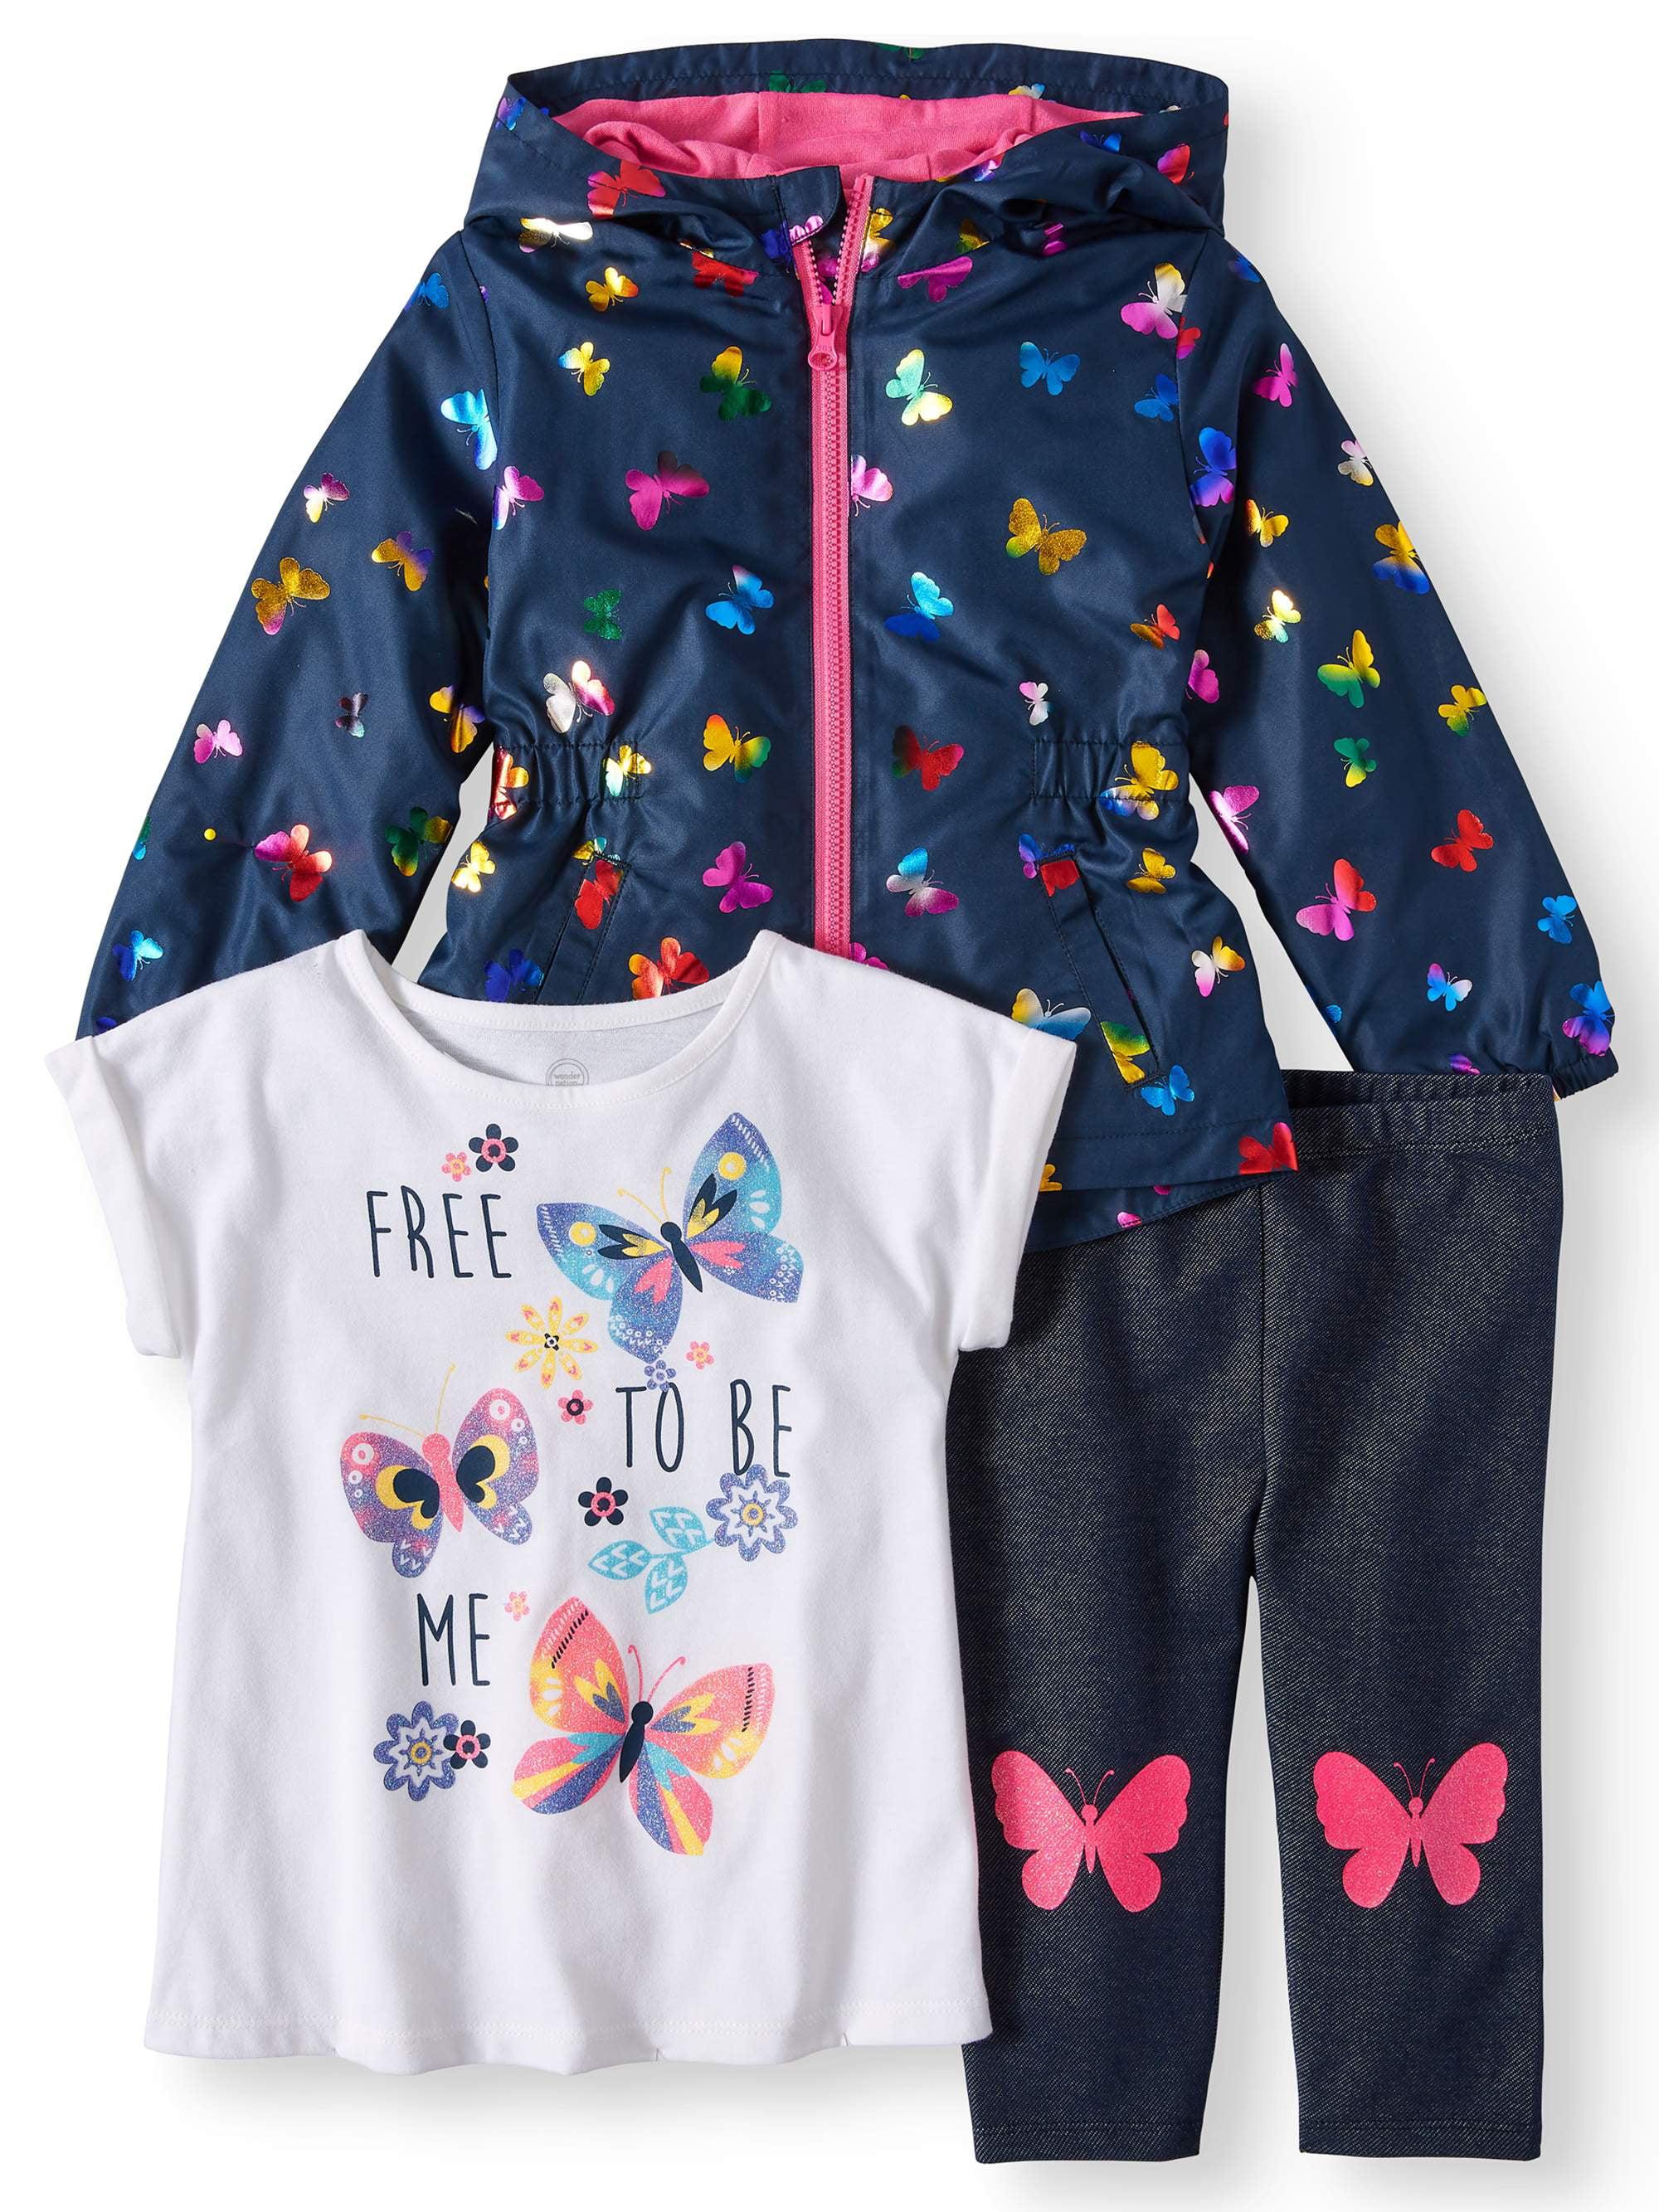 7a57b8e0 Wonder Nation - T-Shirt, Legging & Windbreaker, 3pc Outfit Set (Toddler  Girls) - Walmart.com